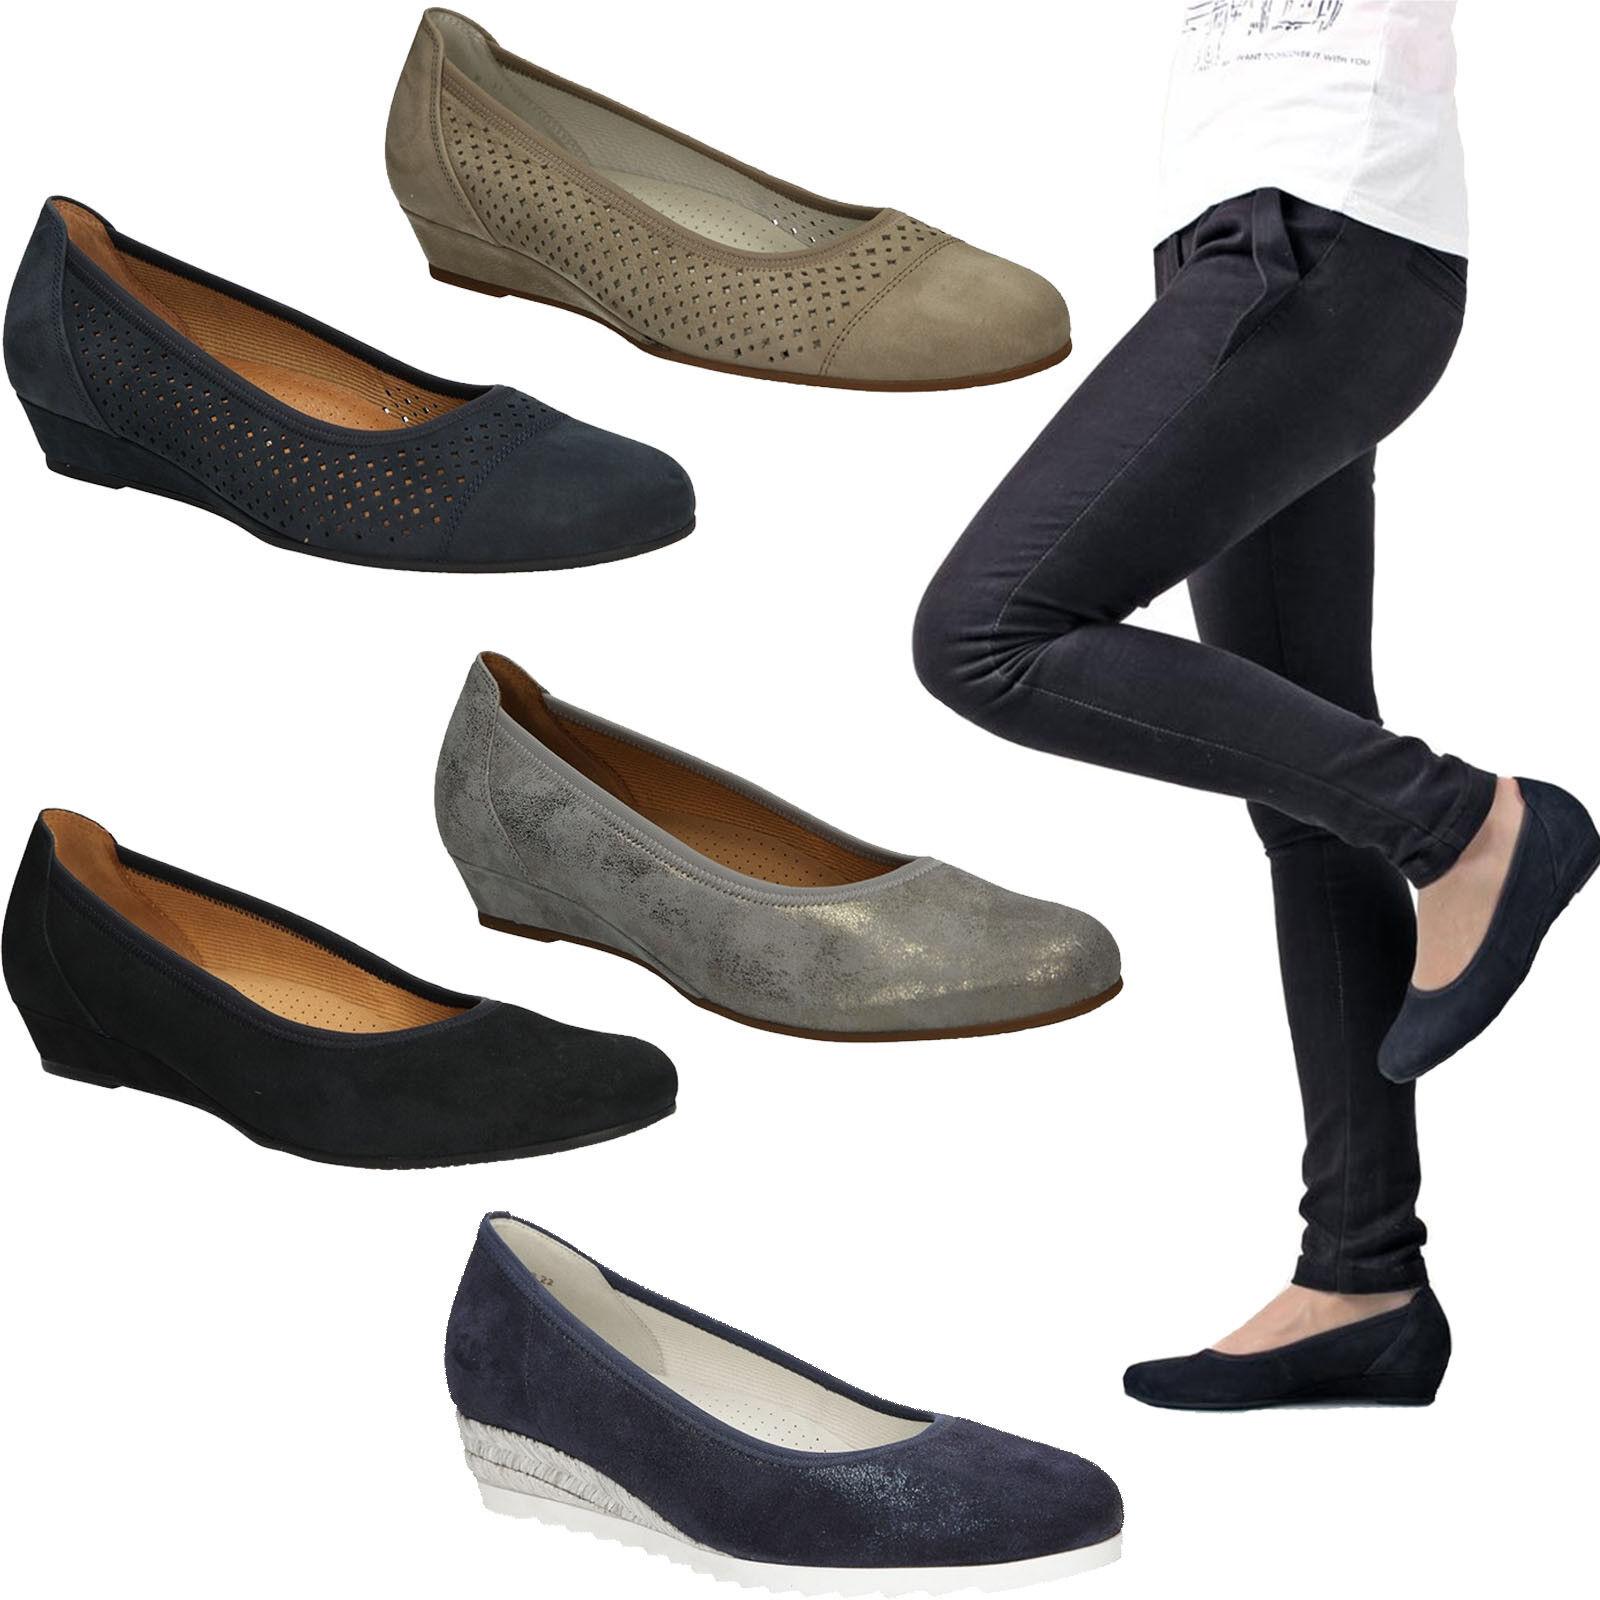 Femmes Ballerines GABOR Chaussures Escarpins Véritable Cuir Talon Compense Taille 36-41 Soldes